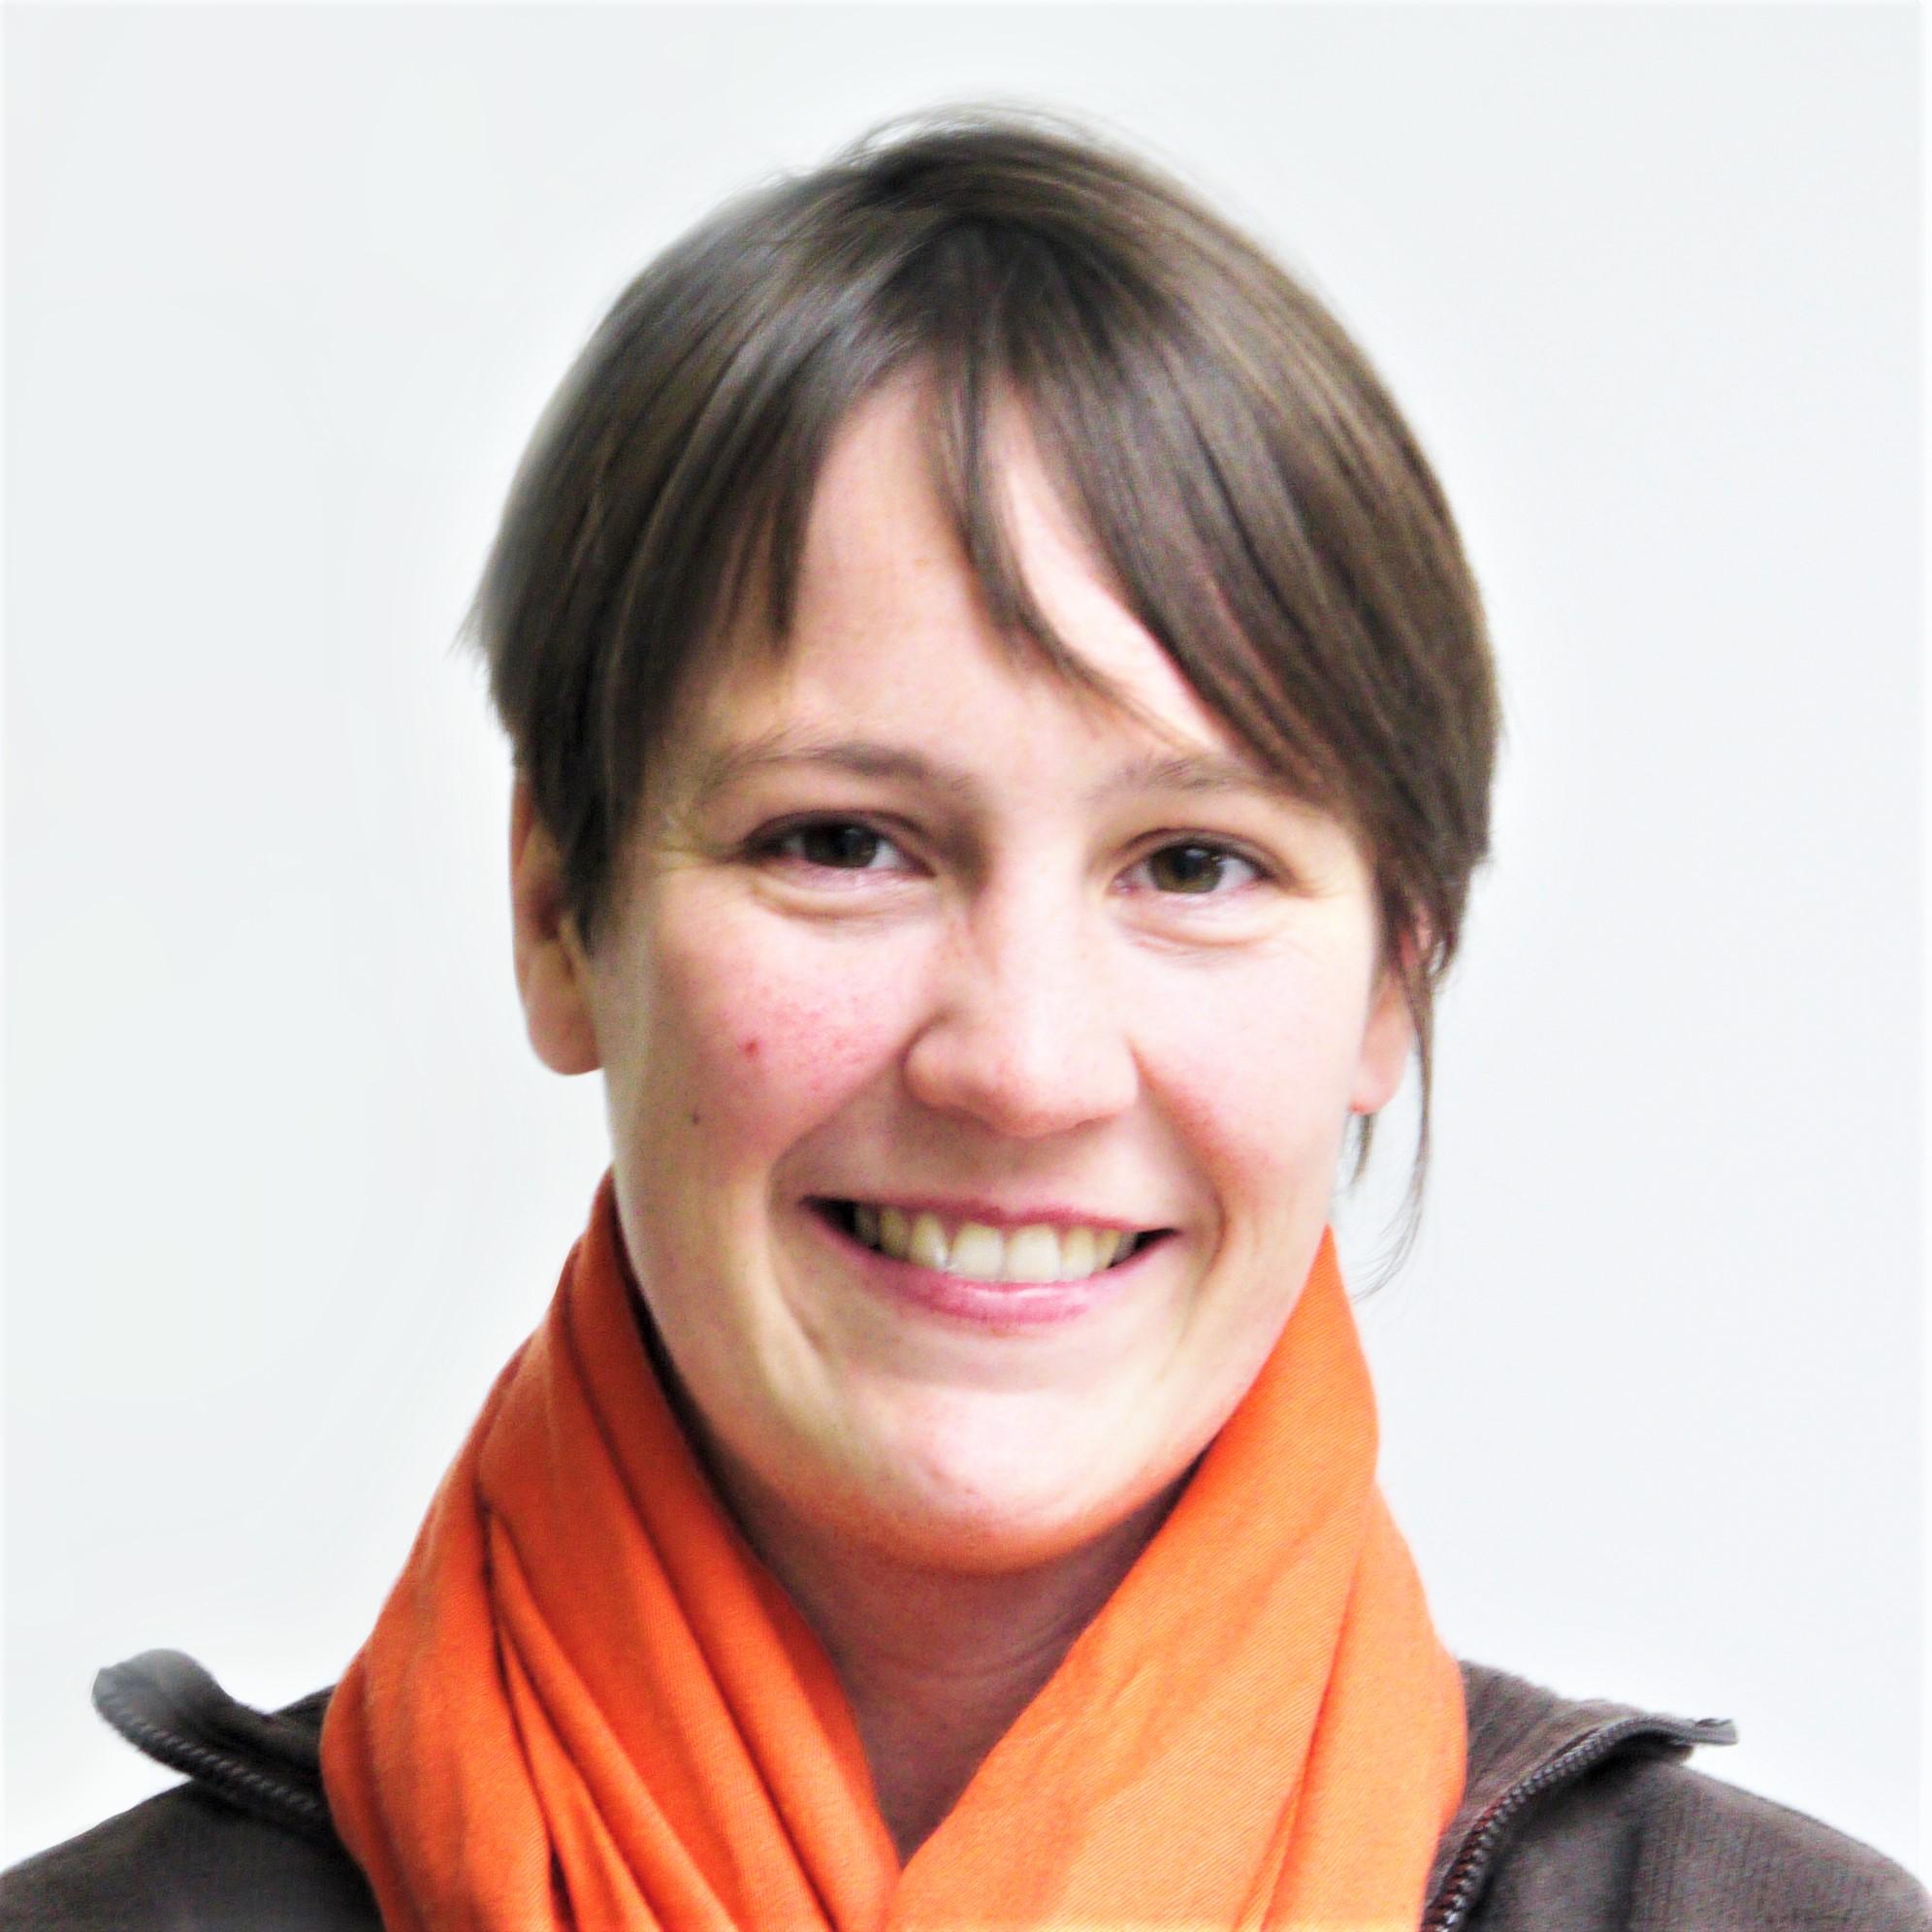 Portret van Nele Vandenbulcke